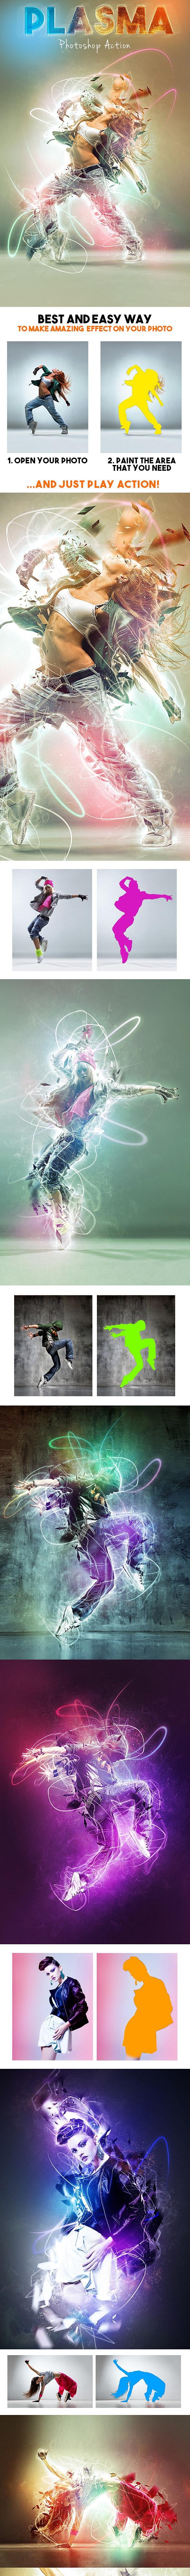 Plasma Photoshop Action - Photo Effects Actions